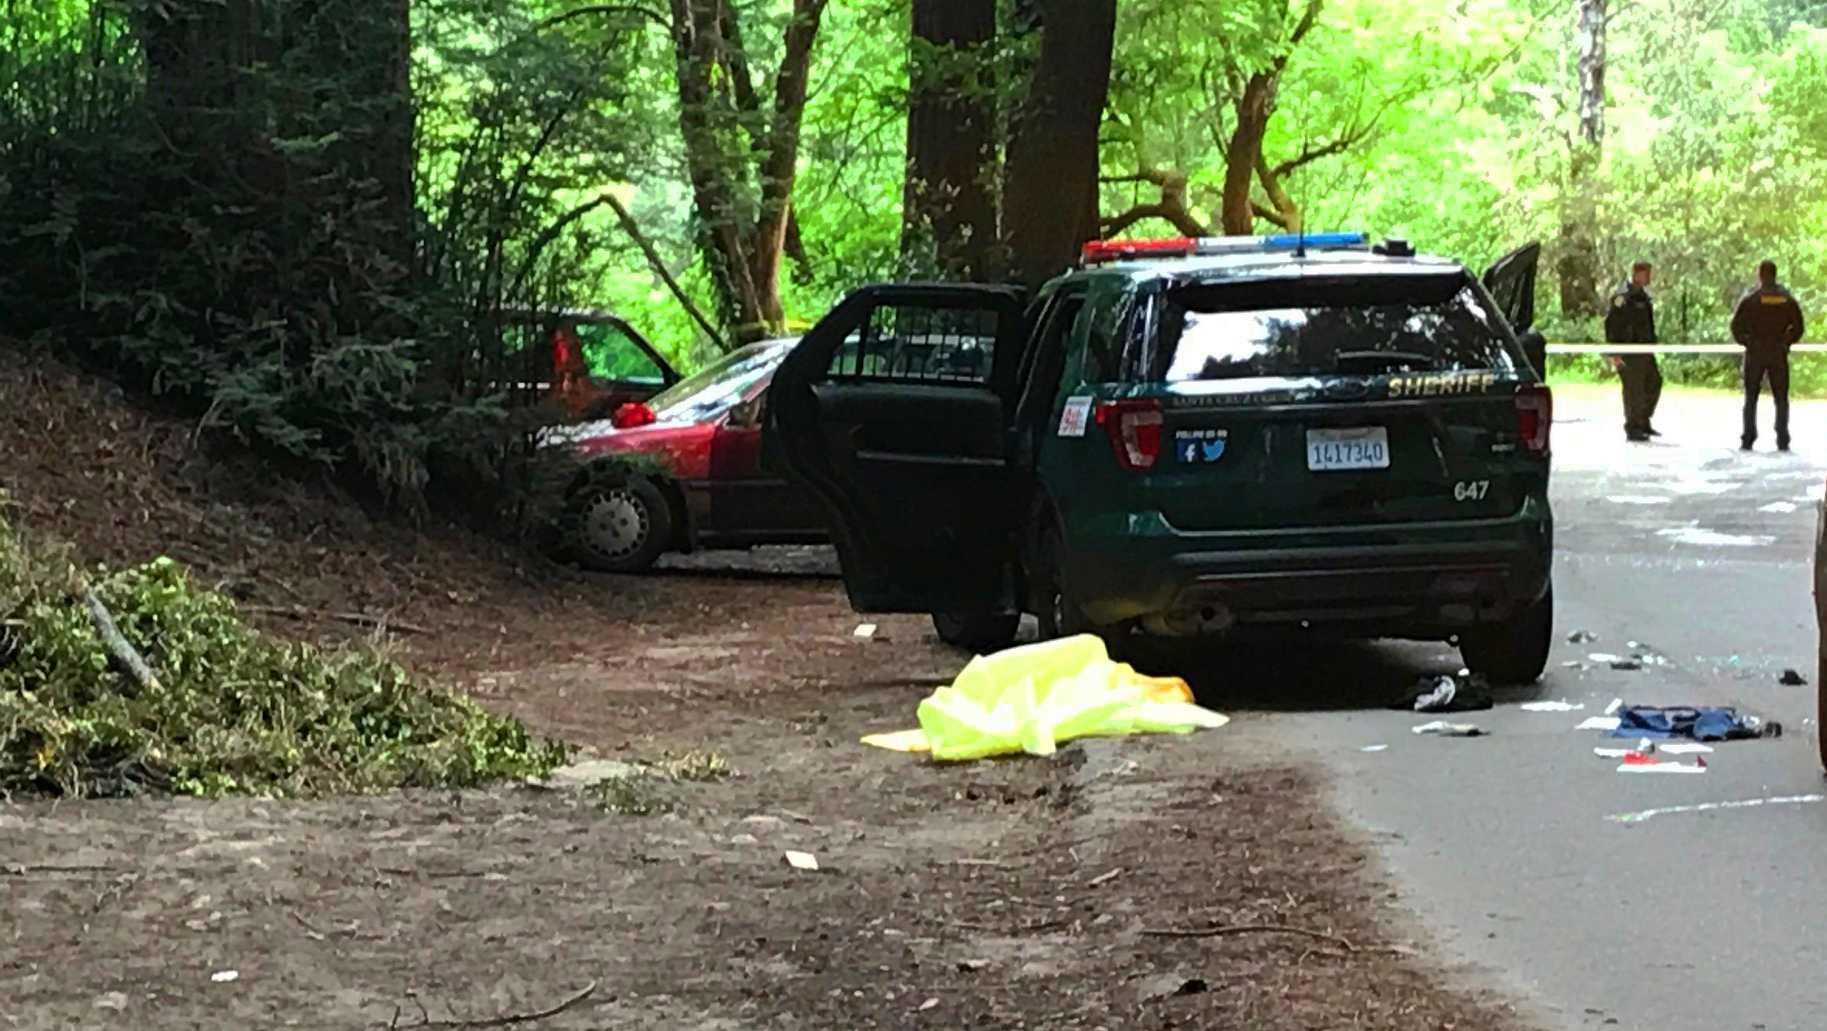 Santa Cruz officer-involved shooting